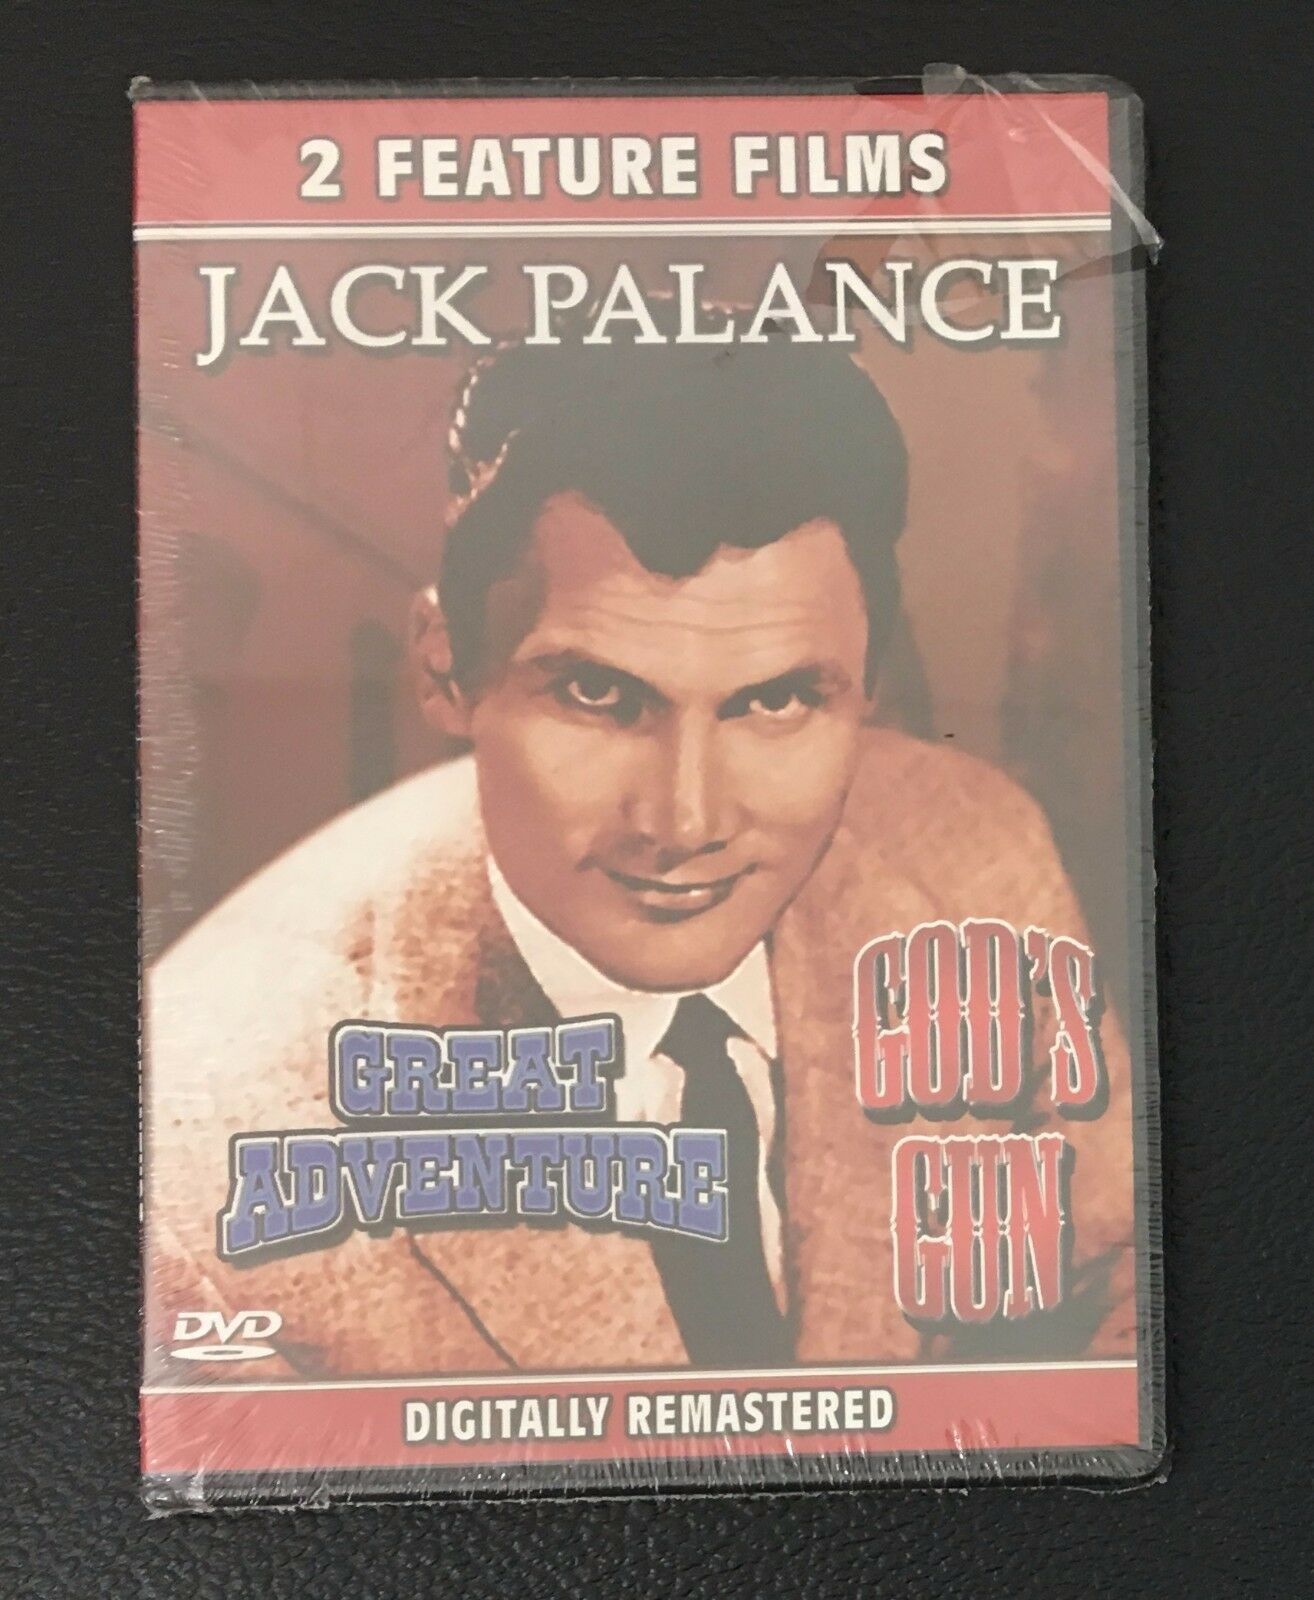 Jack Palance Filmes Pretty jack palance great adventure god's gun on dvd very good d19 | ebay